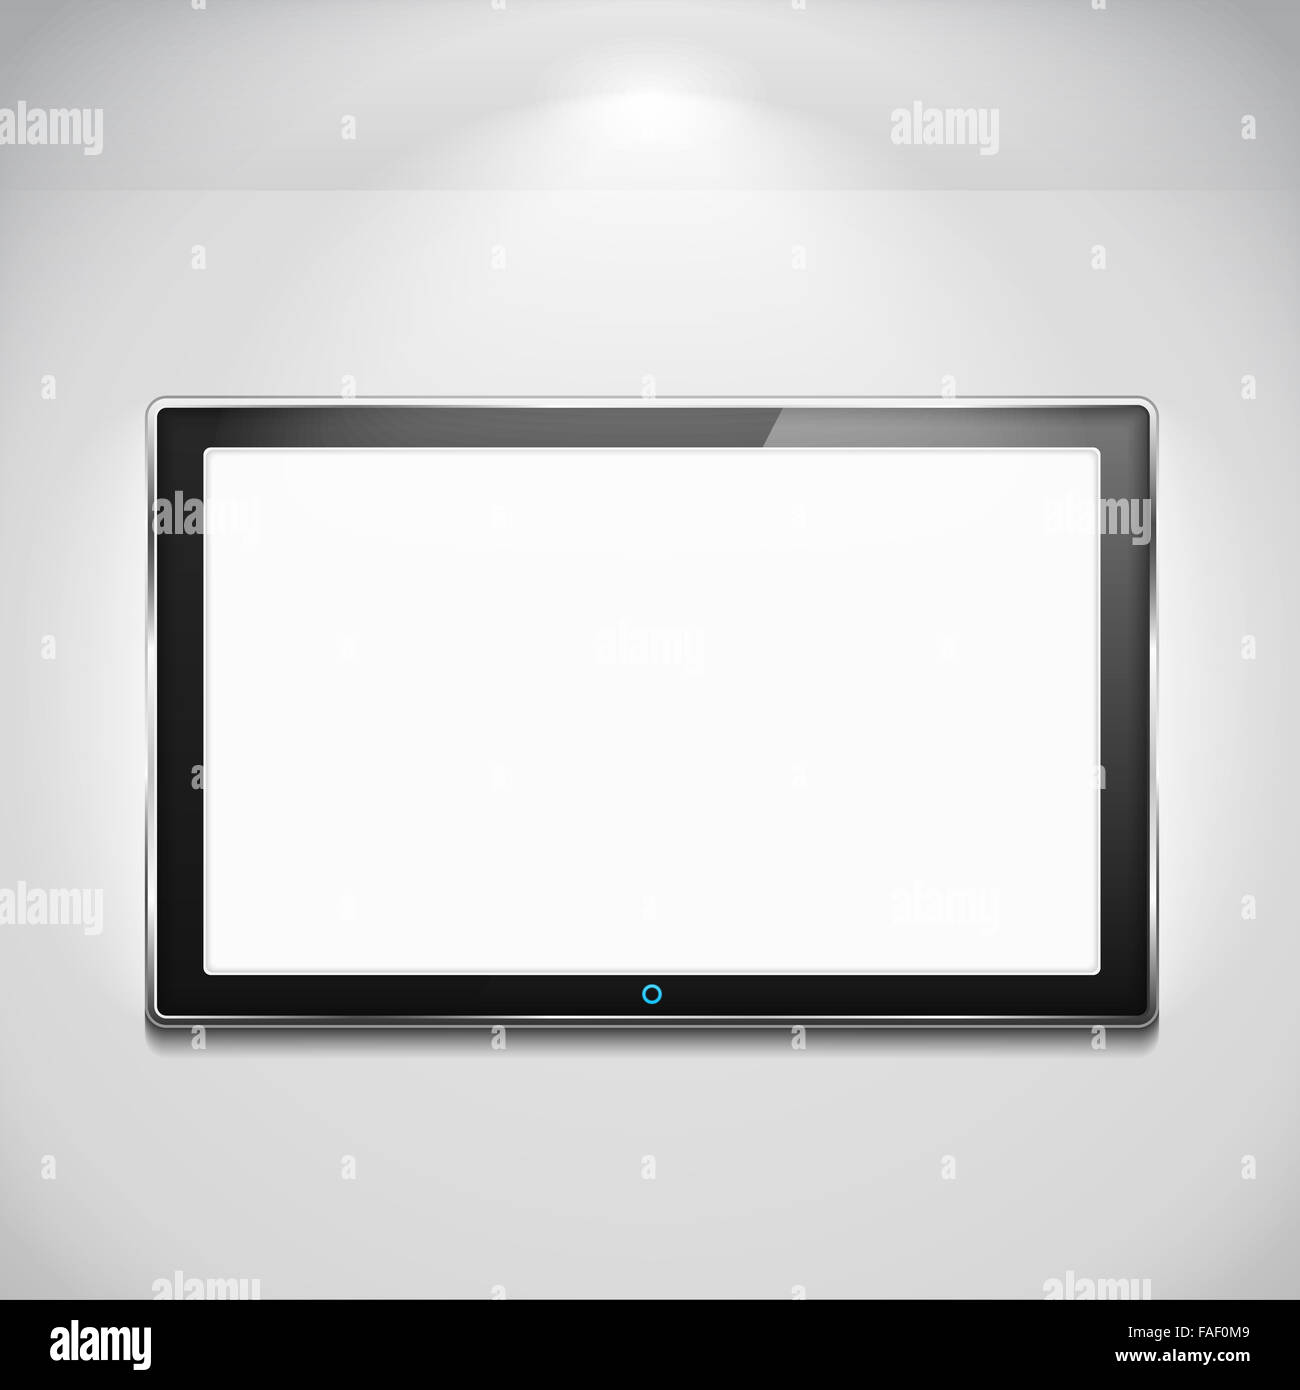 tv monitor wall stockfotos tv monitor wall bilder alamy. Black Bedroom Furniture Sets. Home Design Ideas